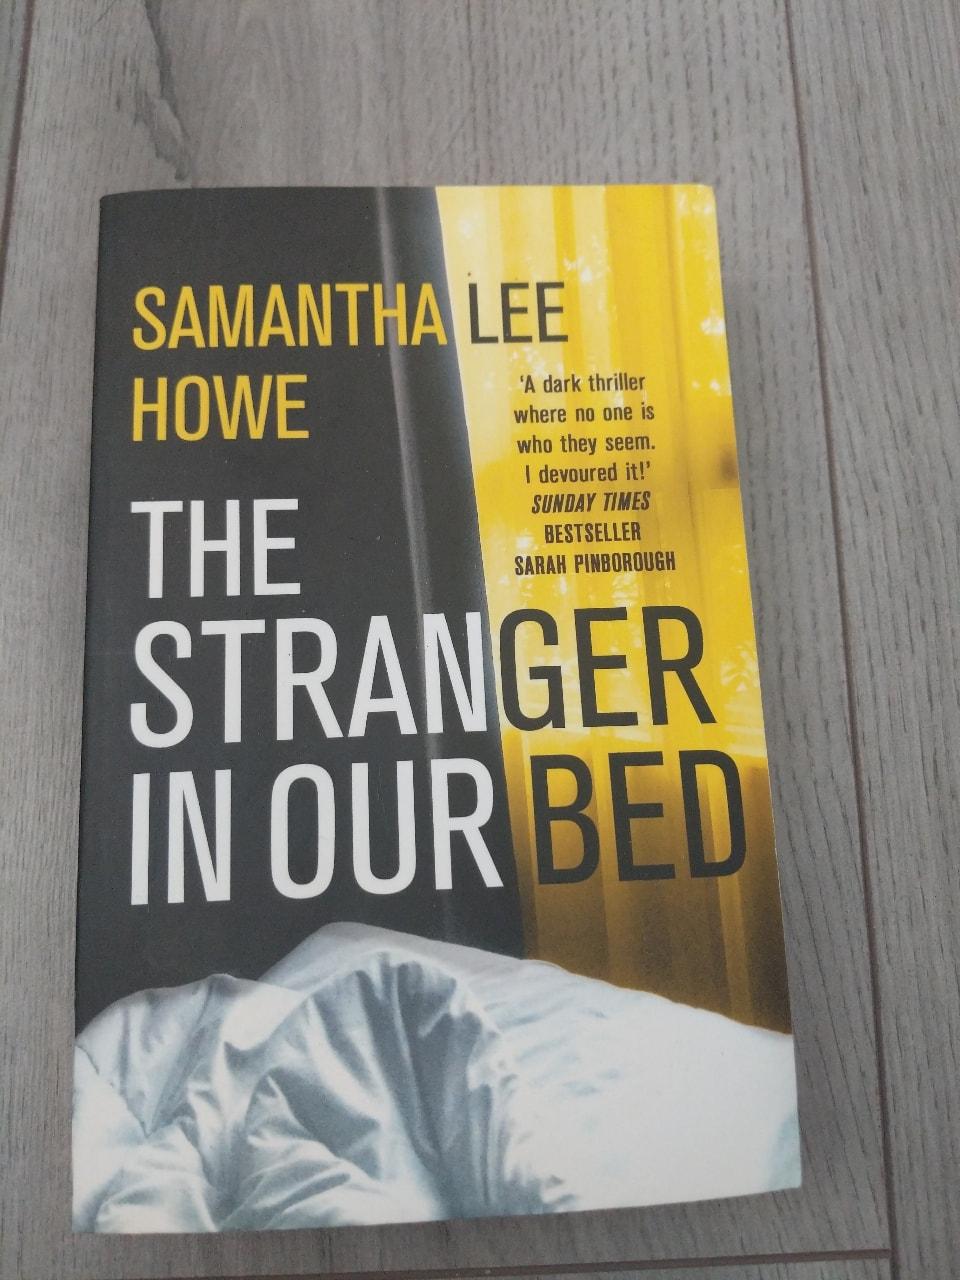 Samantha Lee Howe novel